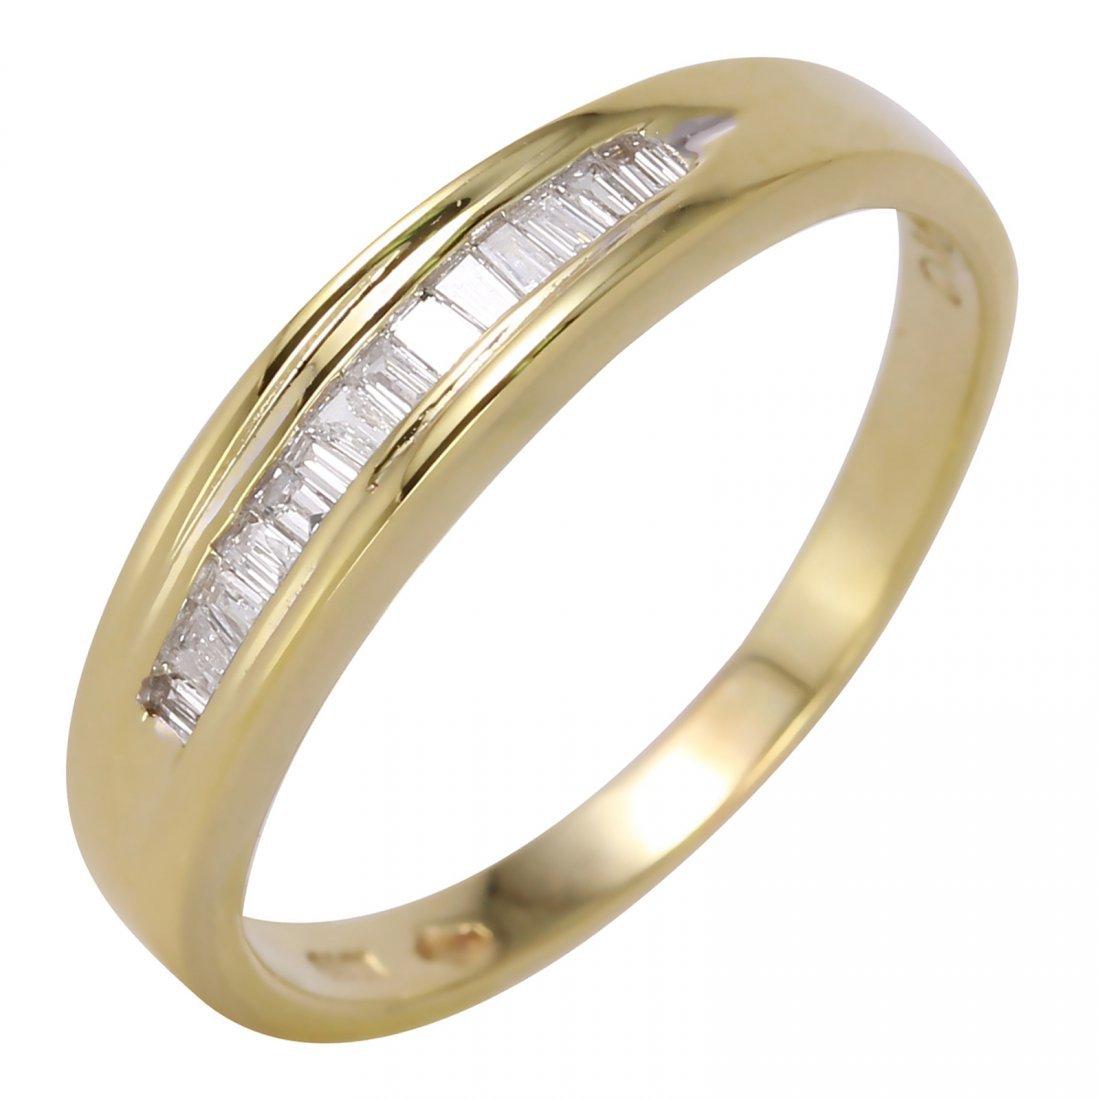 14K Yellow Gold Diamond Wedding Band, 0.25 ctw